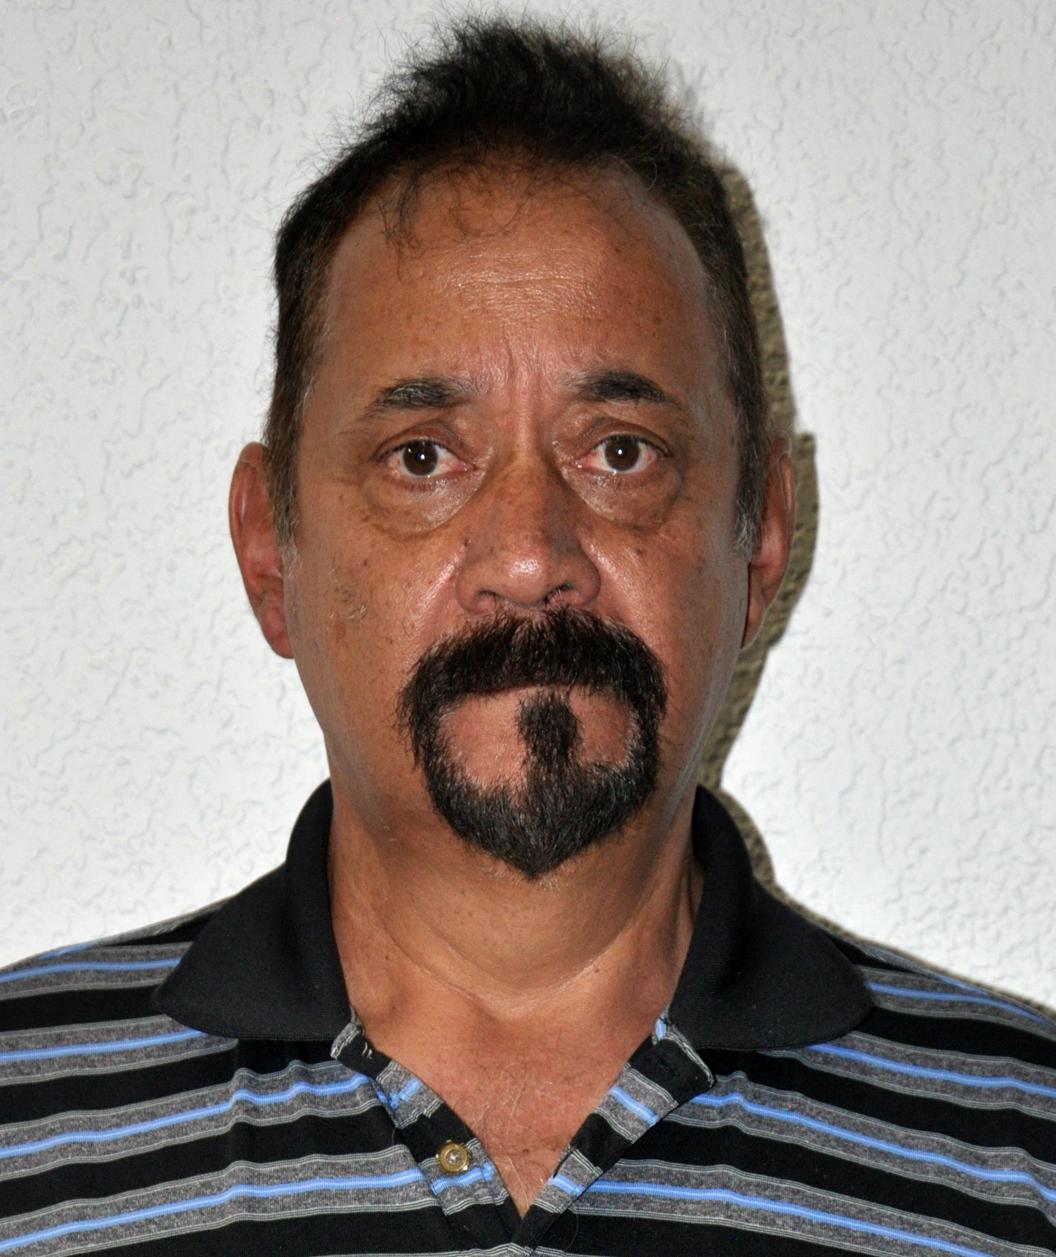 David Humberto